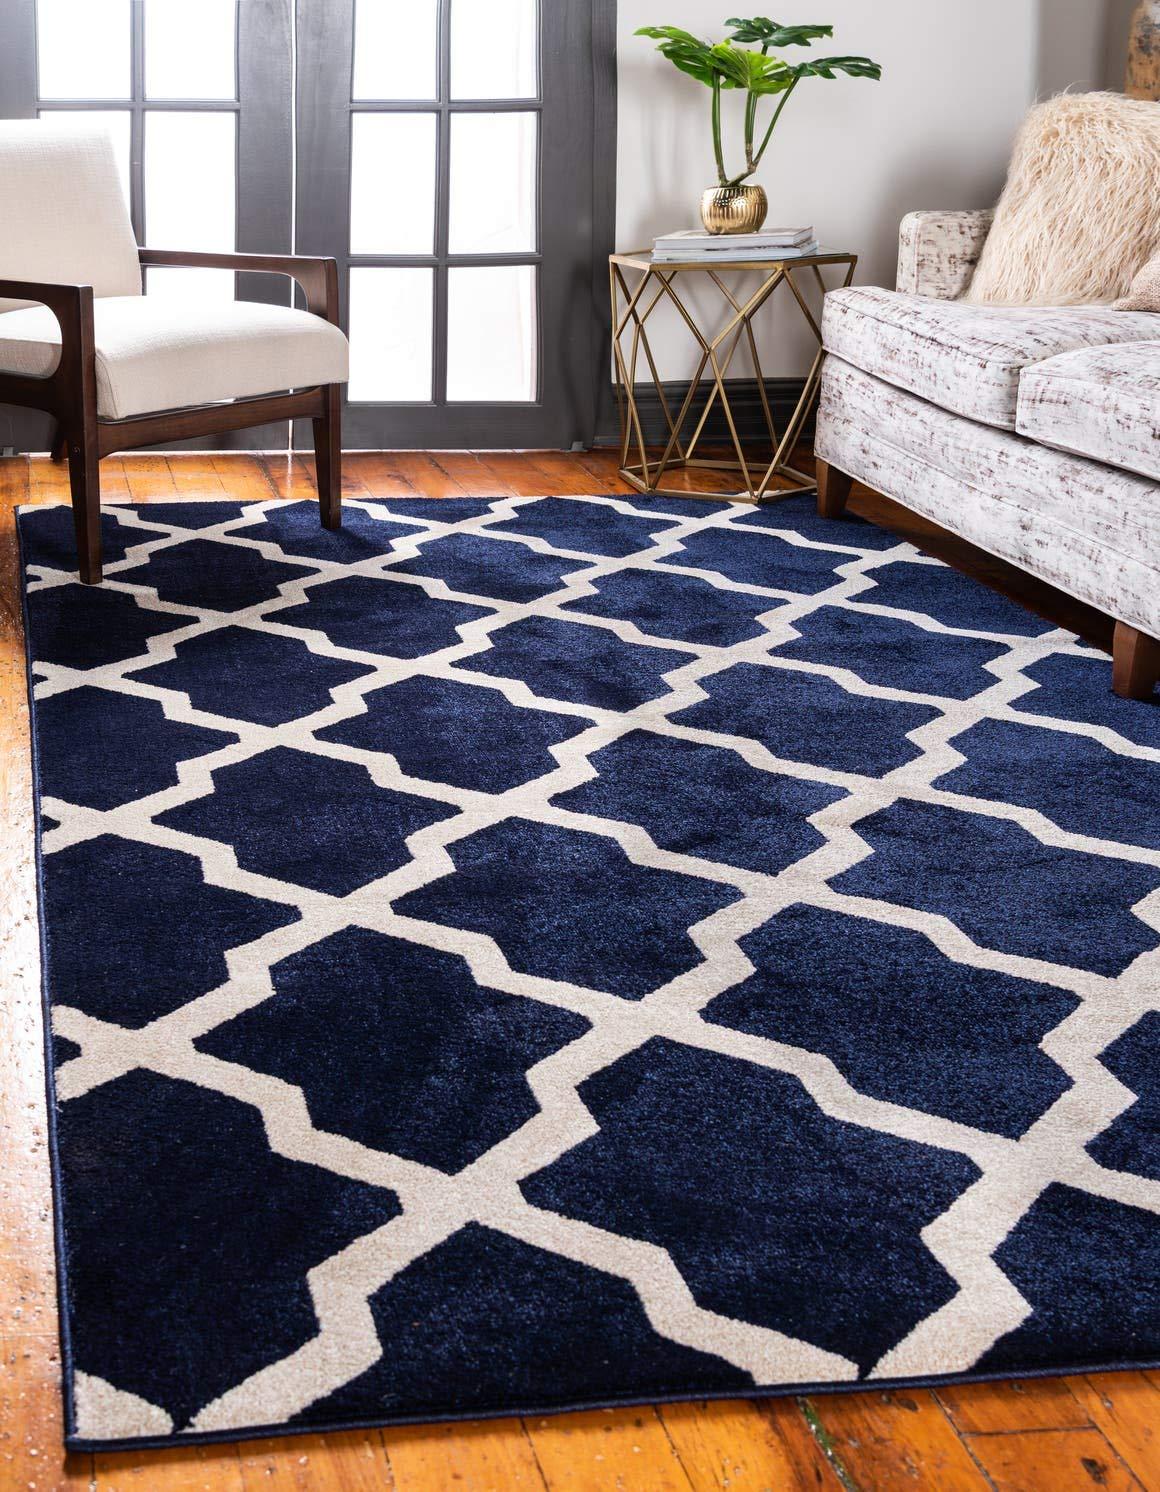 Unique Loom Trellis Collection Geometric Modern Navy Blue Area Rug 5 0 x 8 0